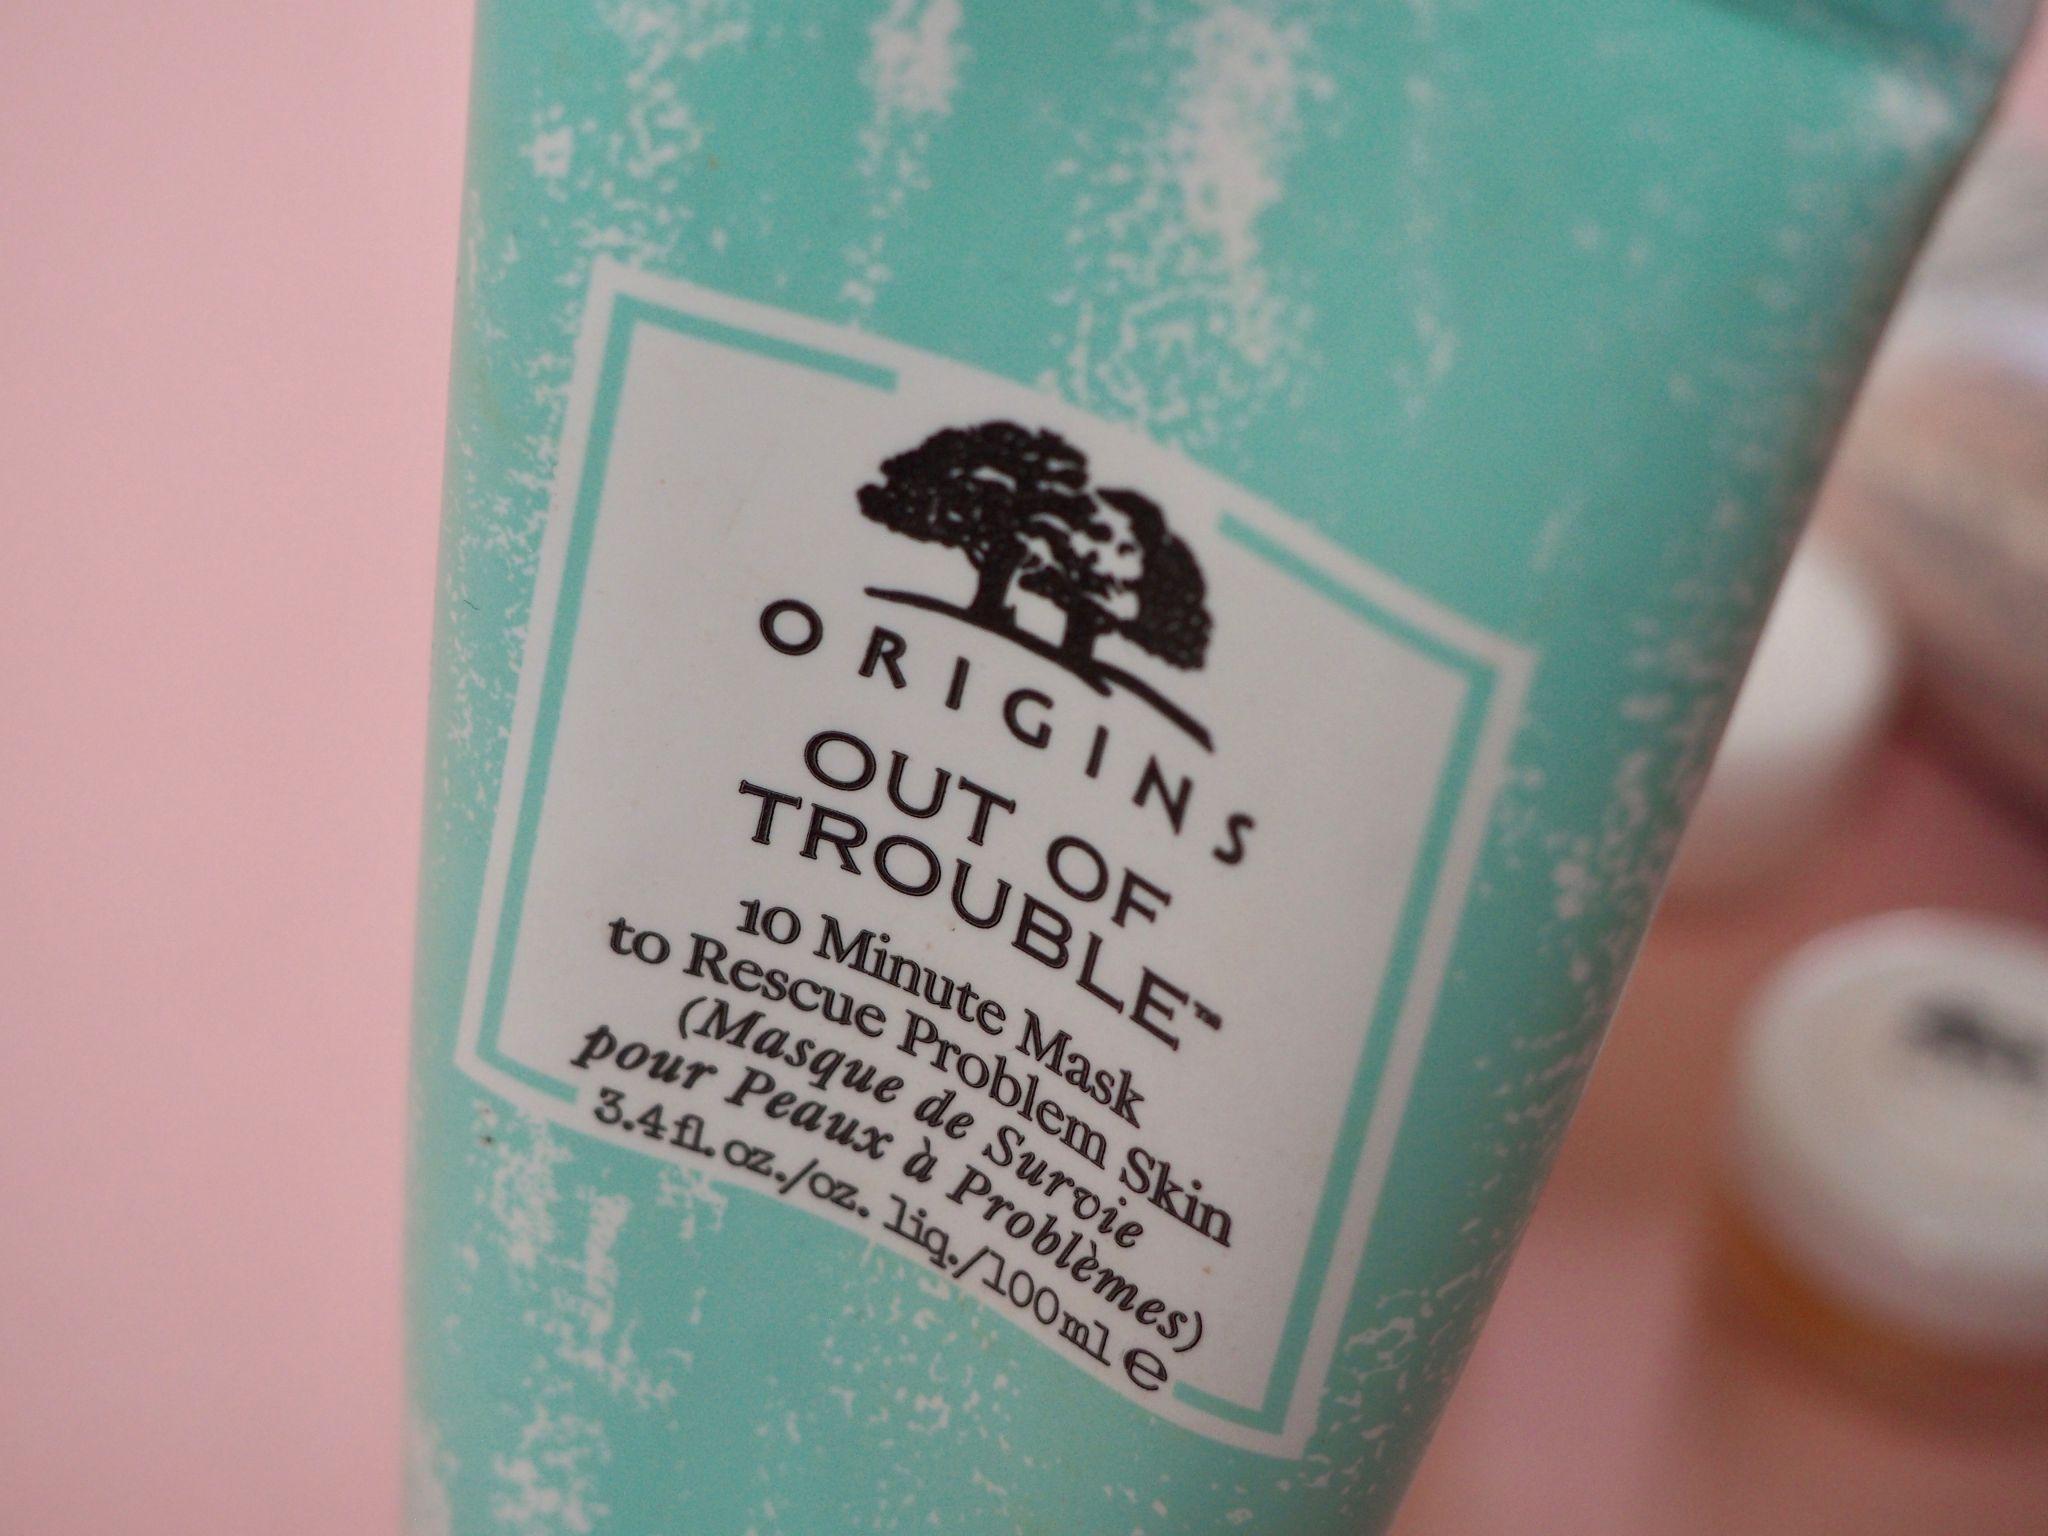 Origins brand insight